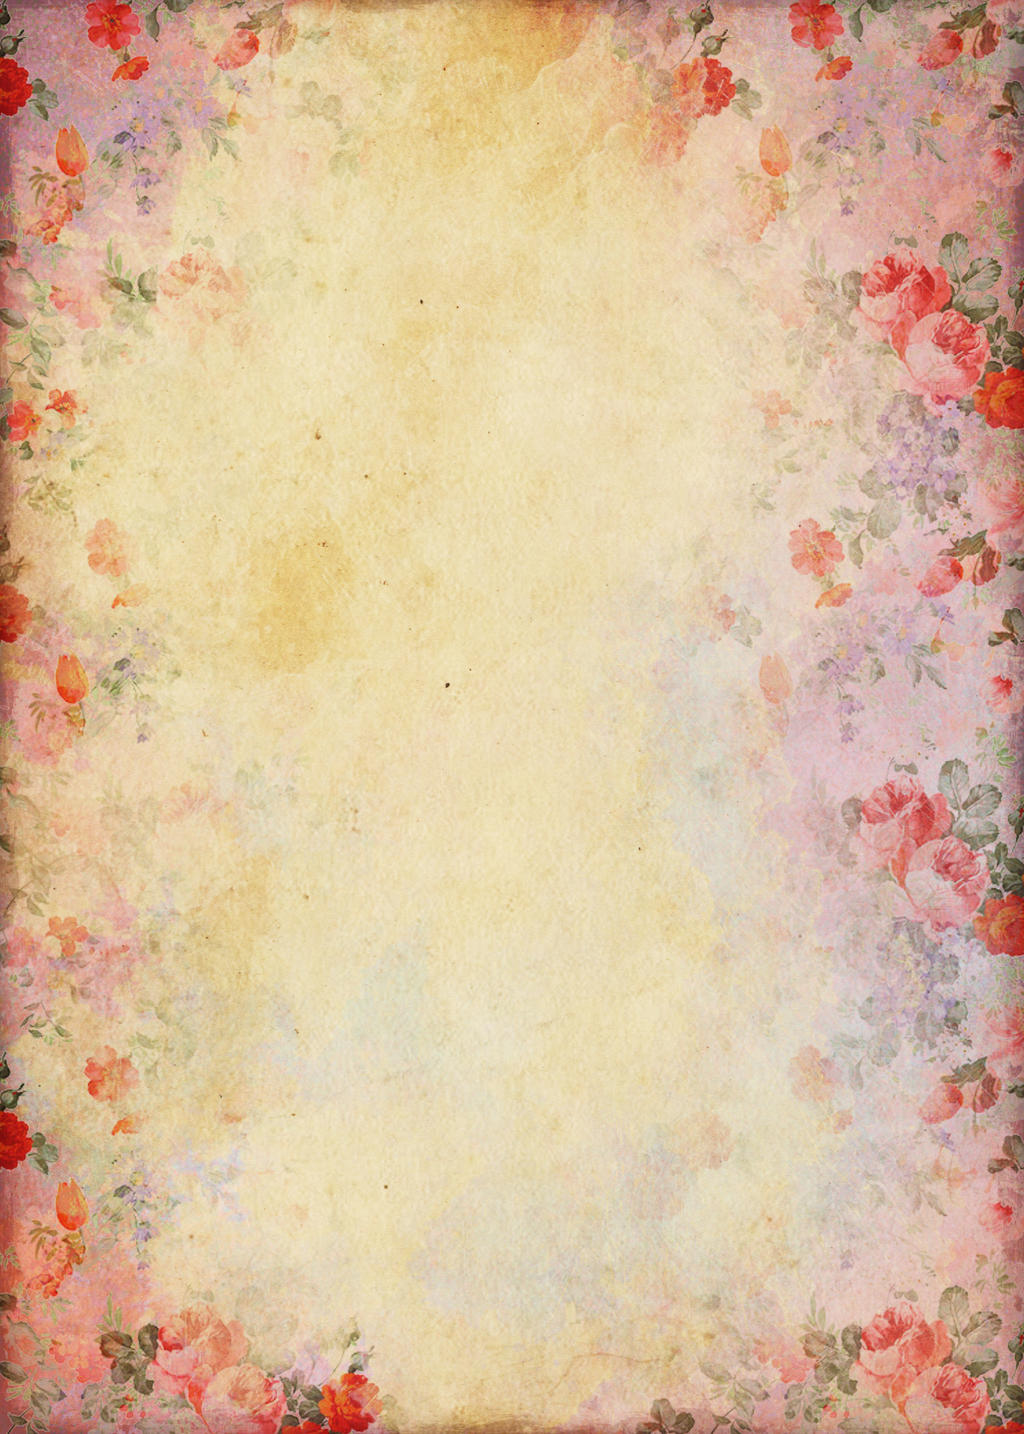 Flower background paper demirediffusion freebie shabby flower paper background by miabumbag on deviantart mightylinksfo